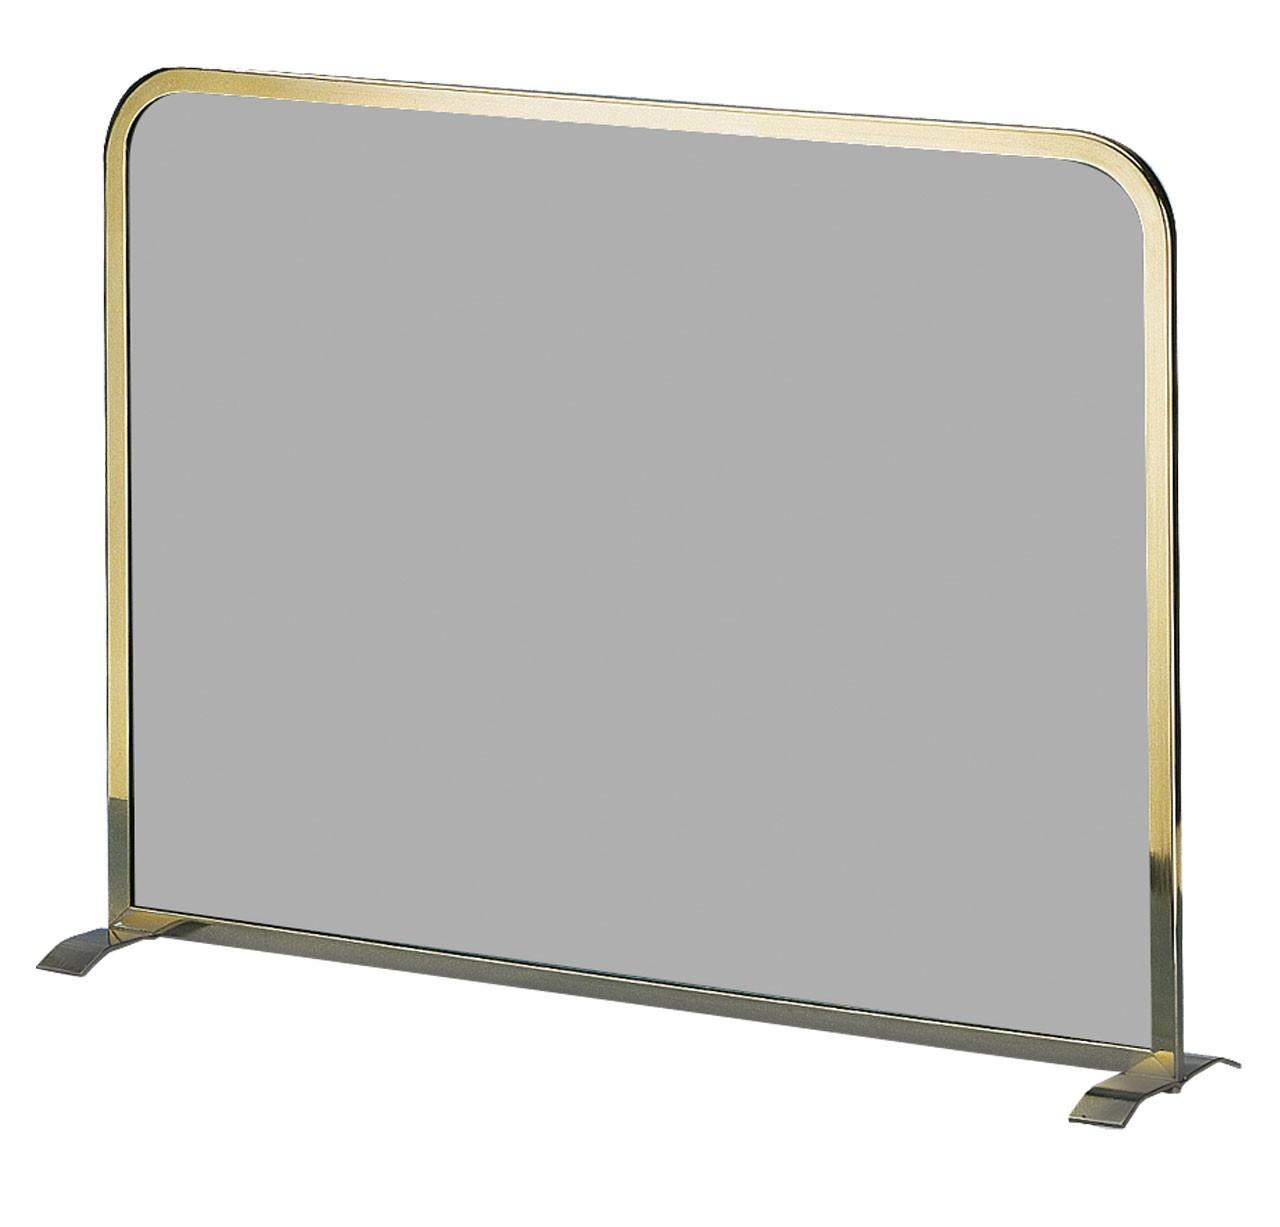 Funkenschutz - Funkenschutzglas Lienbacher Messing getönt 65x49cm Bild 1